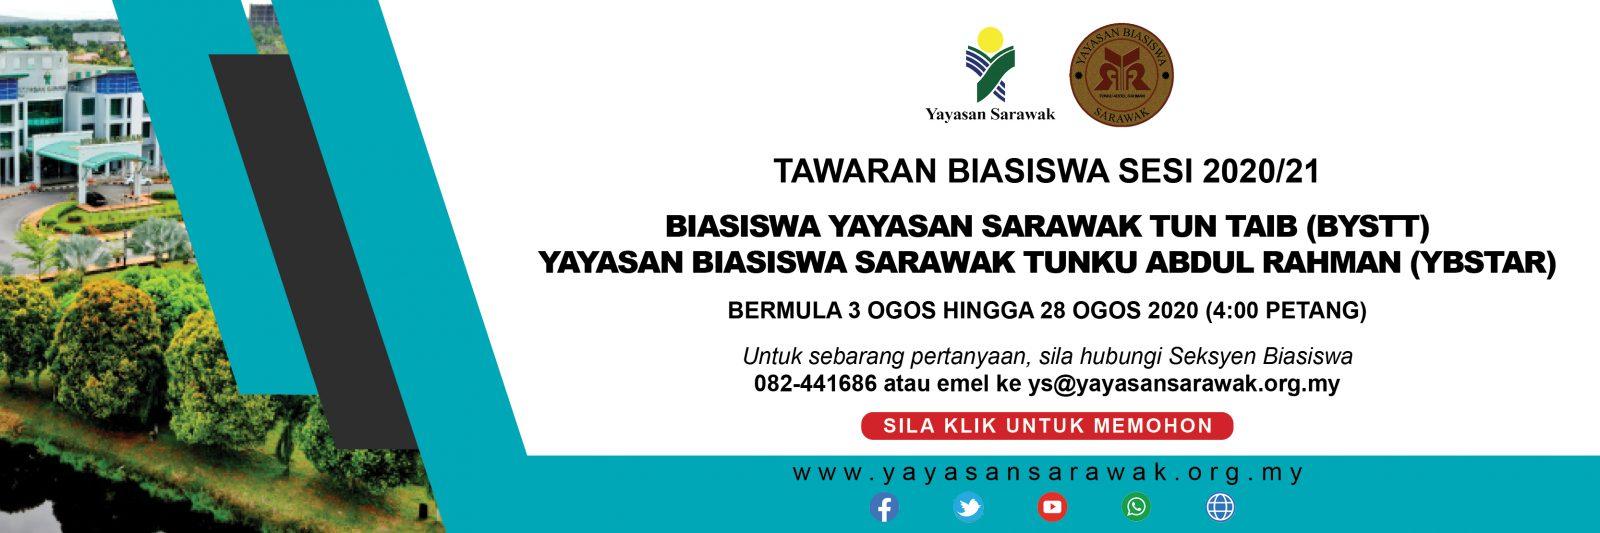 The Sarawak Foundation Yayasan Sarawak